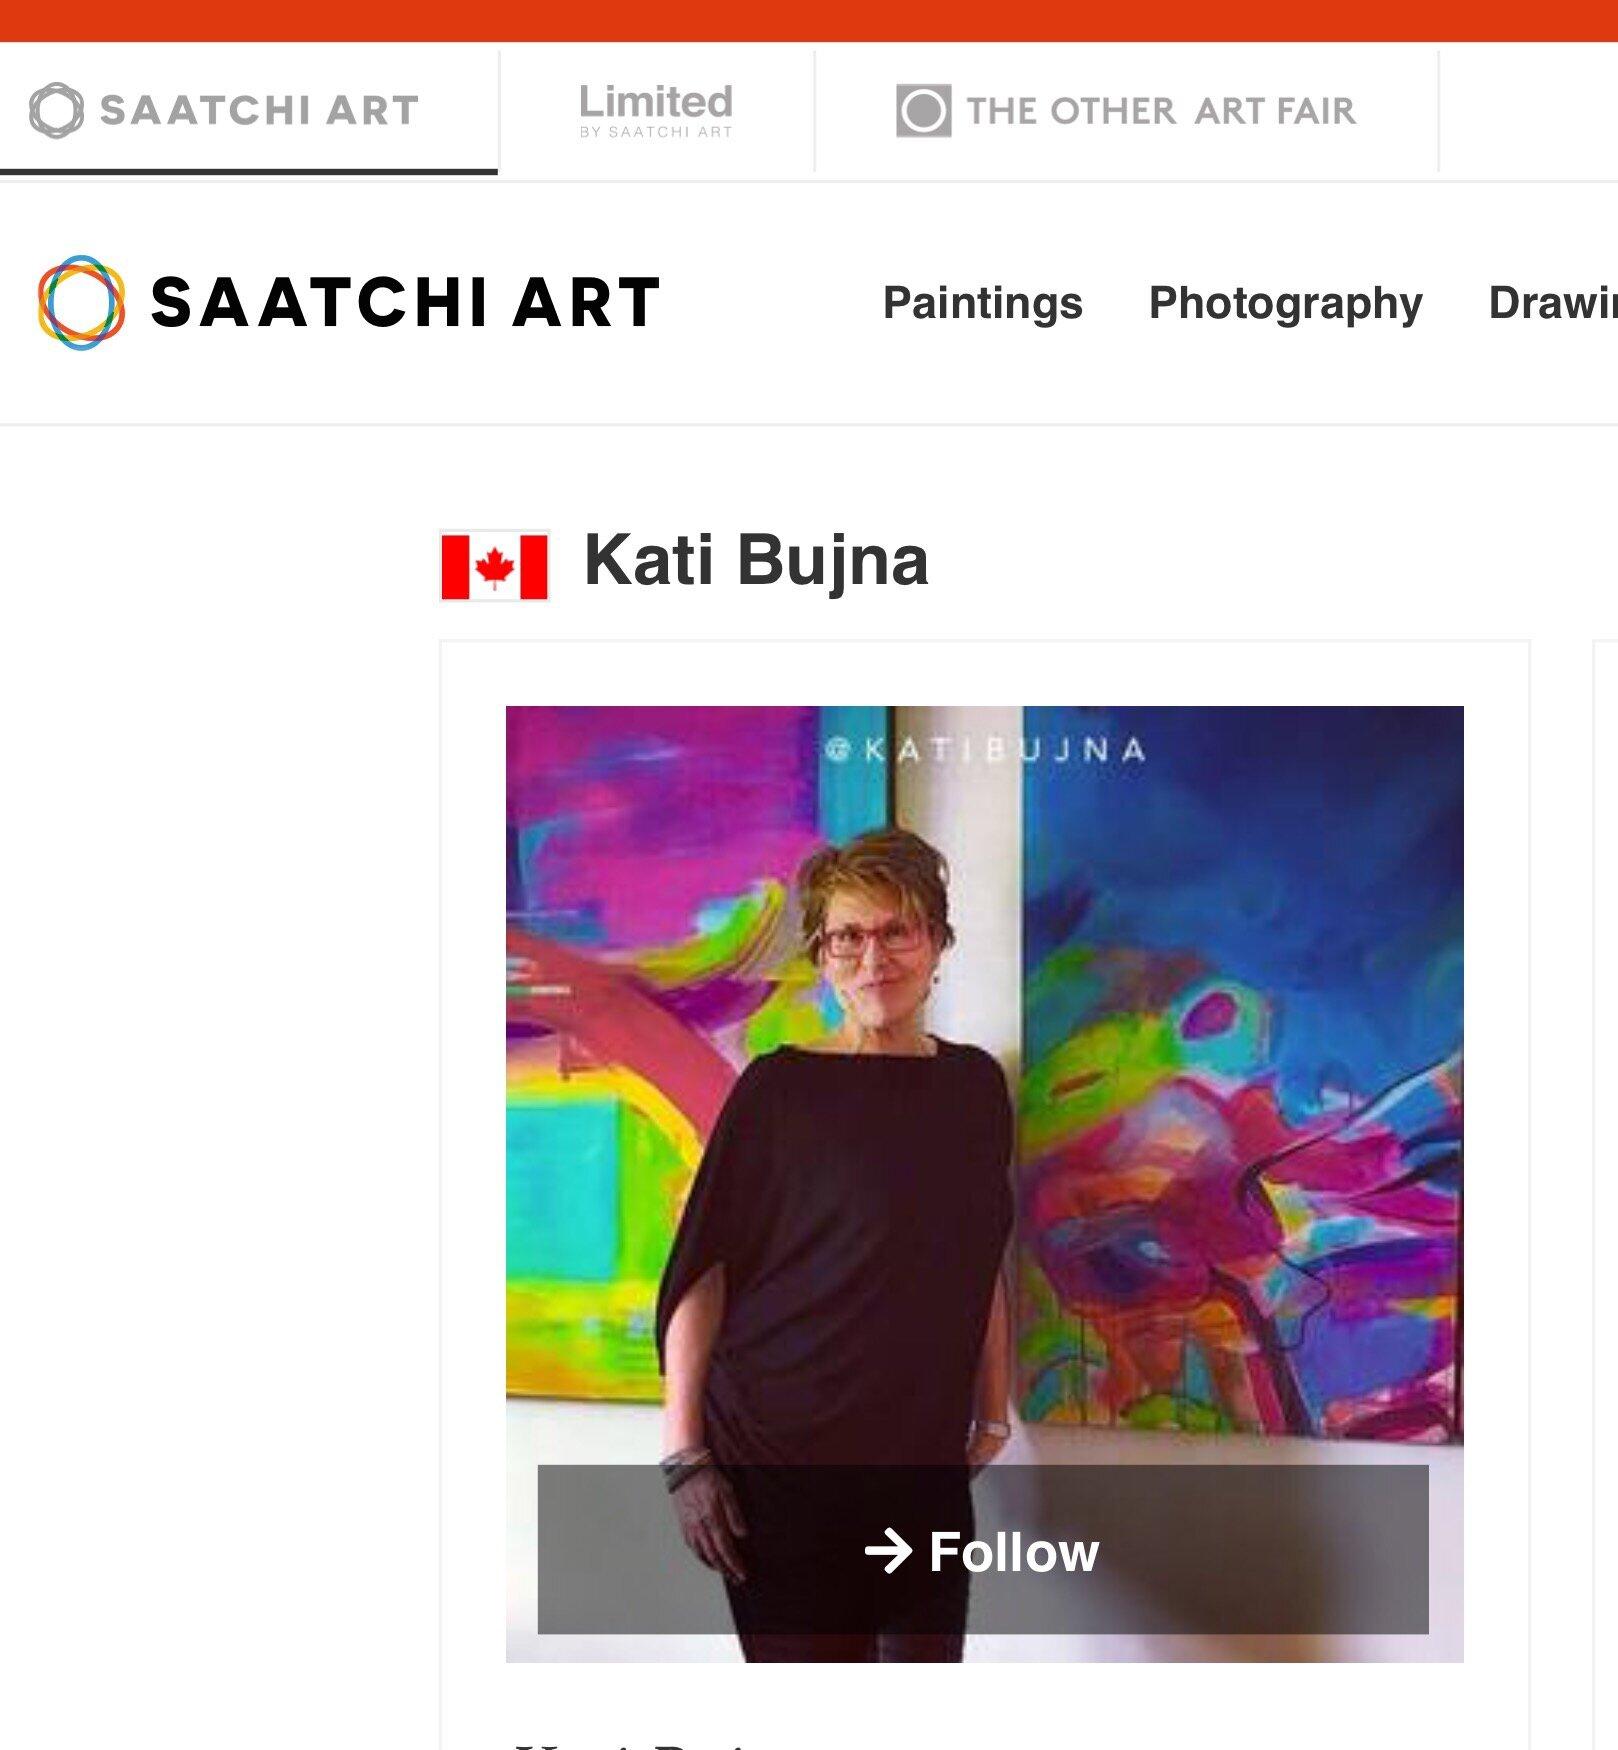 Featured on Saatchi Art.com